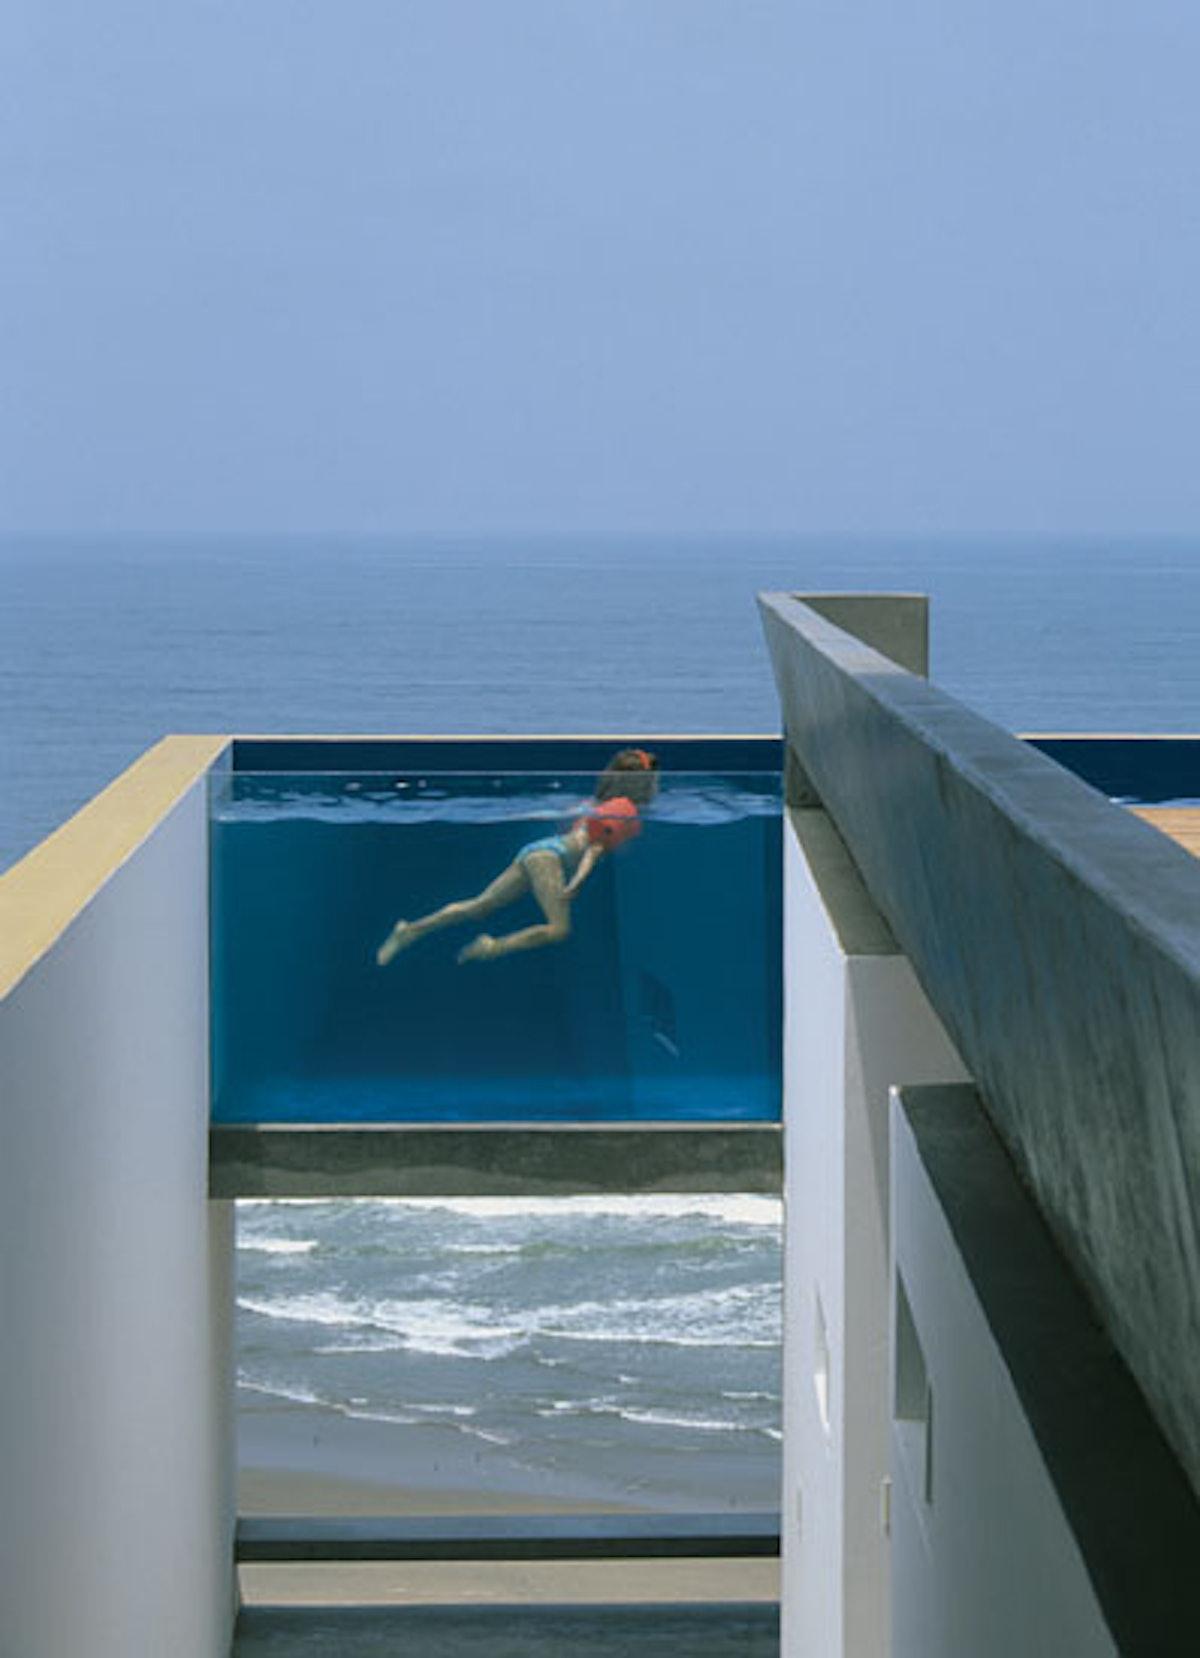 arss-pools-reflections-05-v.jpg